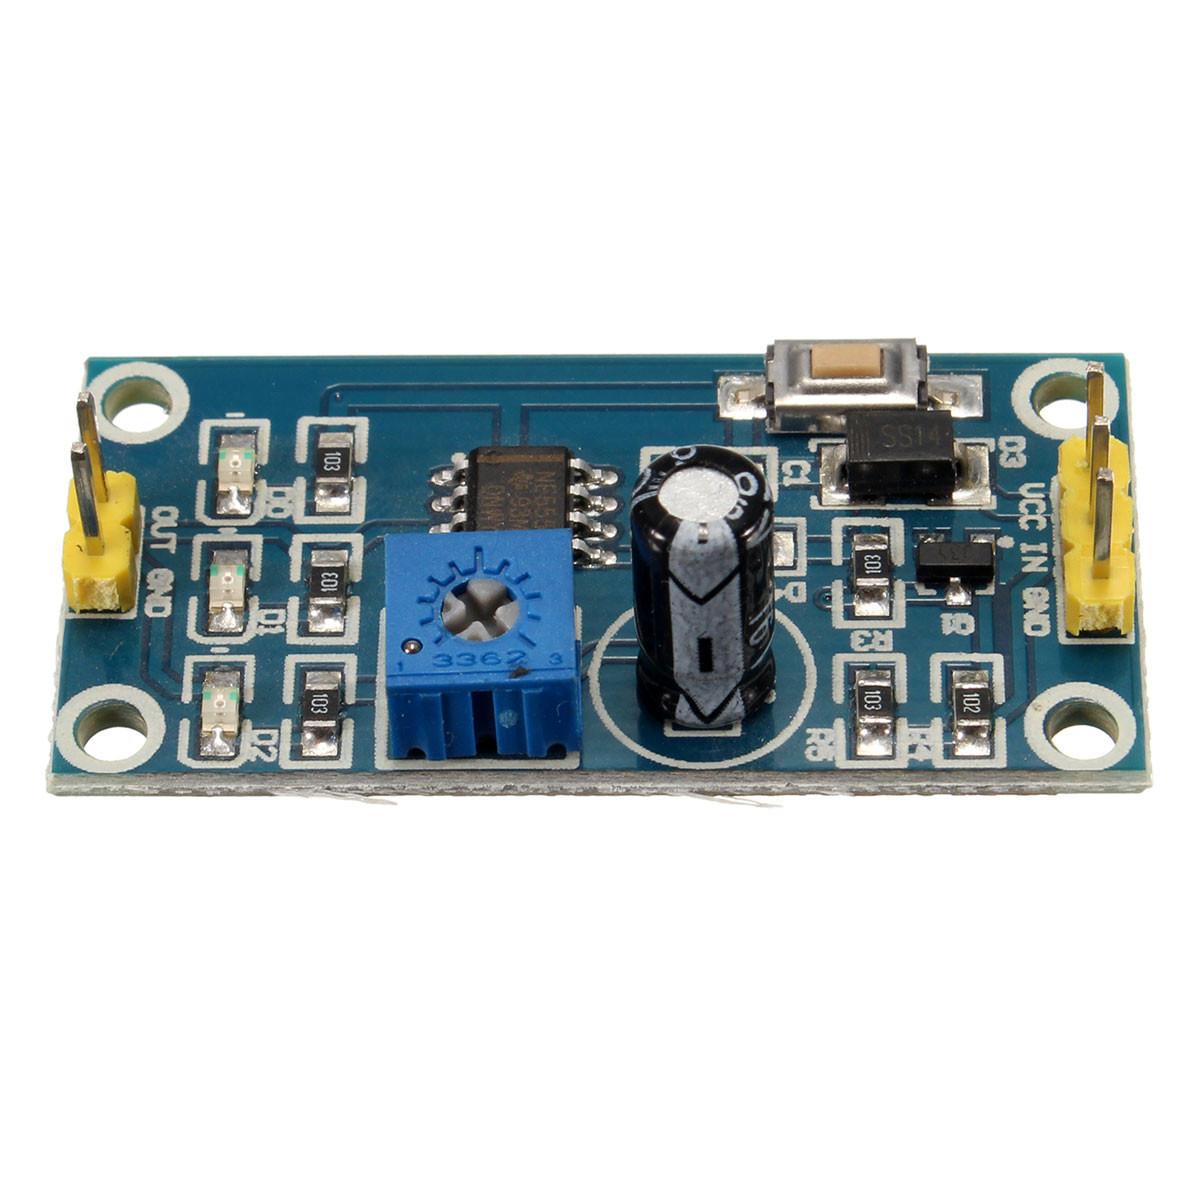 5pcs DC 5-12V Adjustable Delay Timer Switch NE555 Relay Shield Module image 3